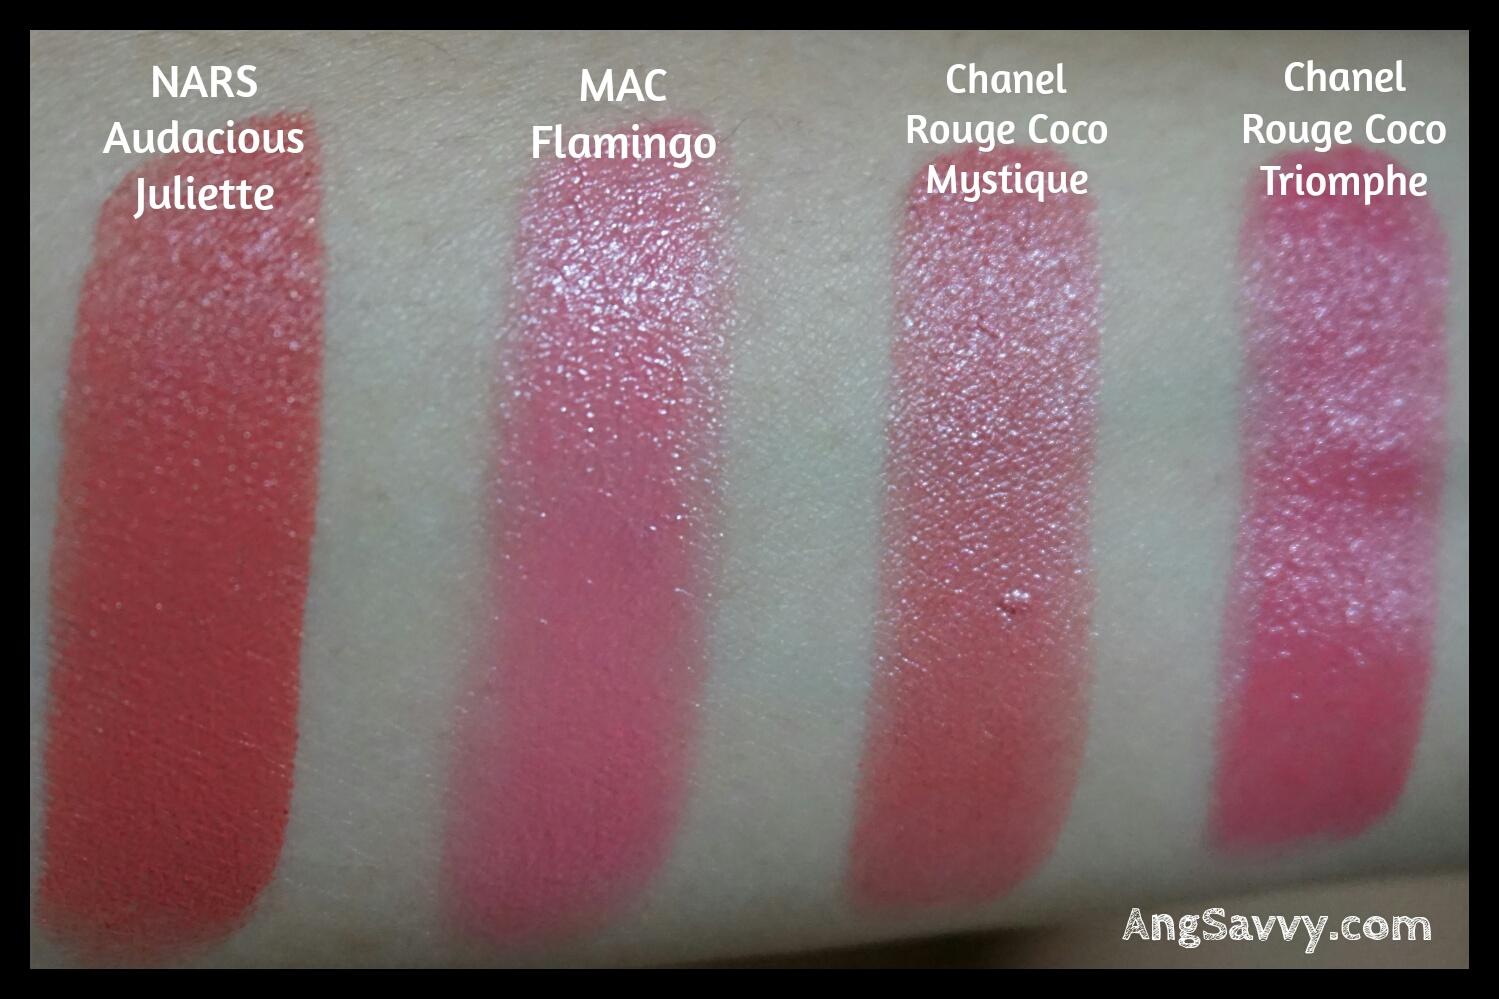 NARS Audacious Lipstick in Juliette Swatch